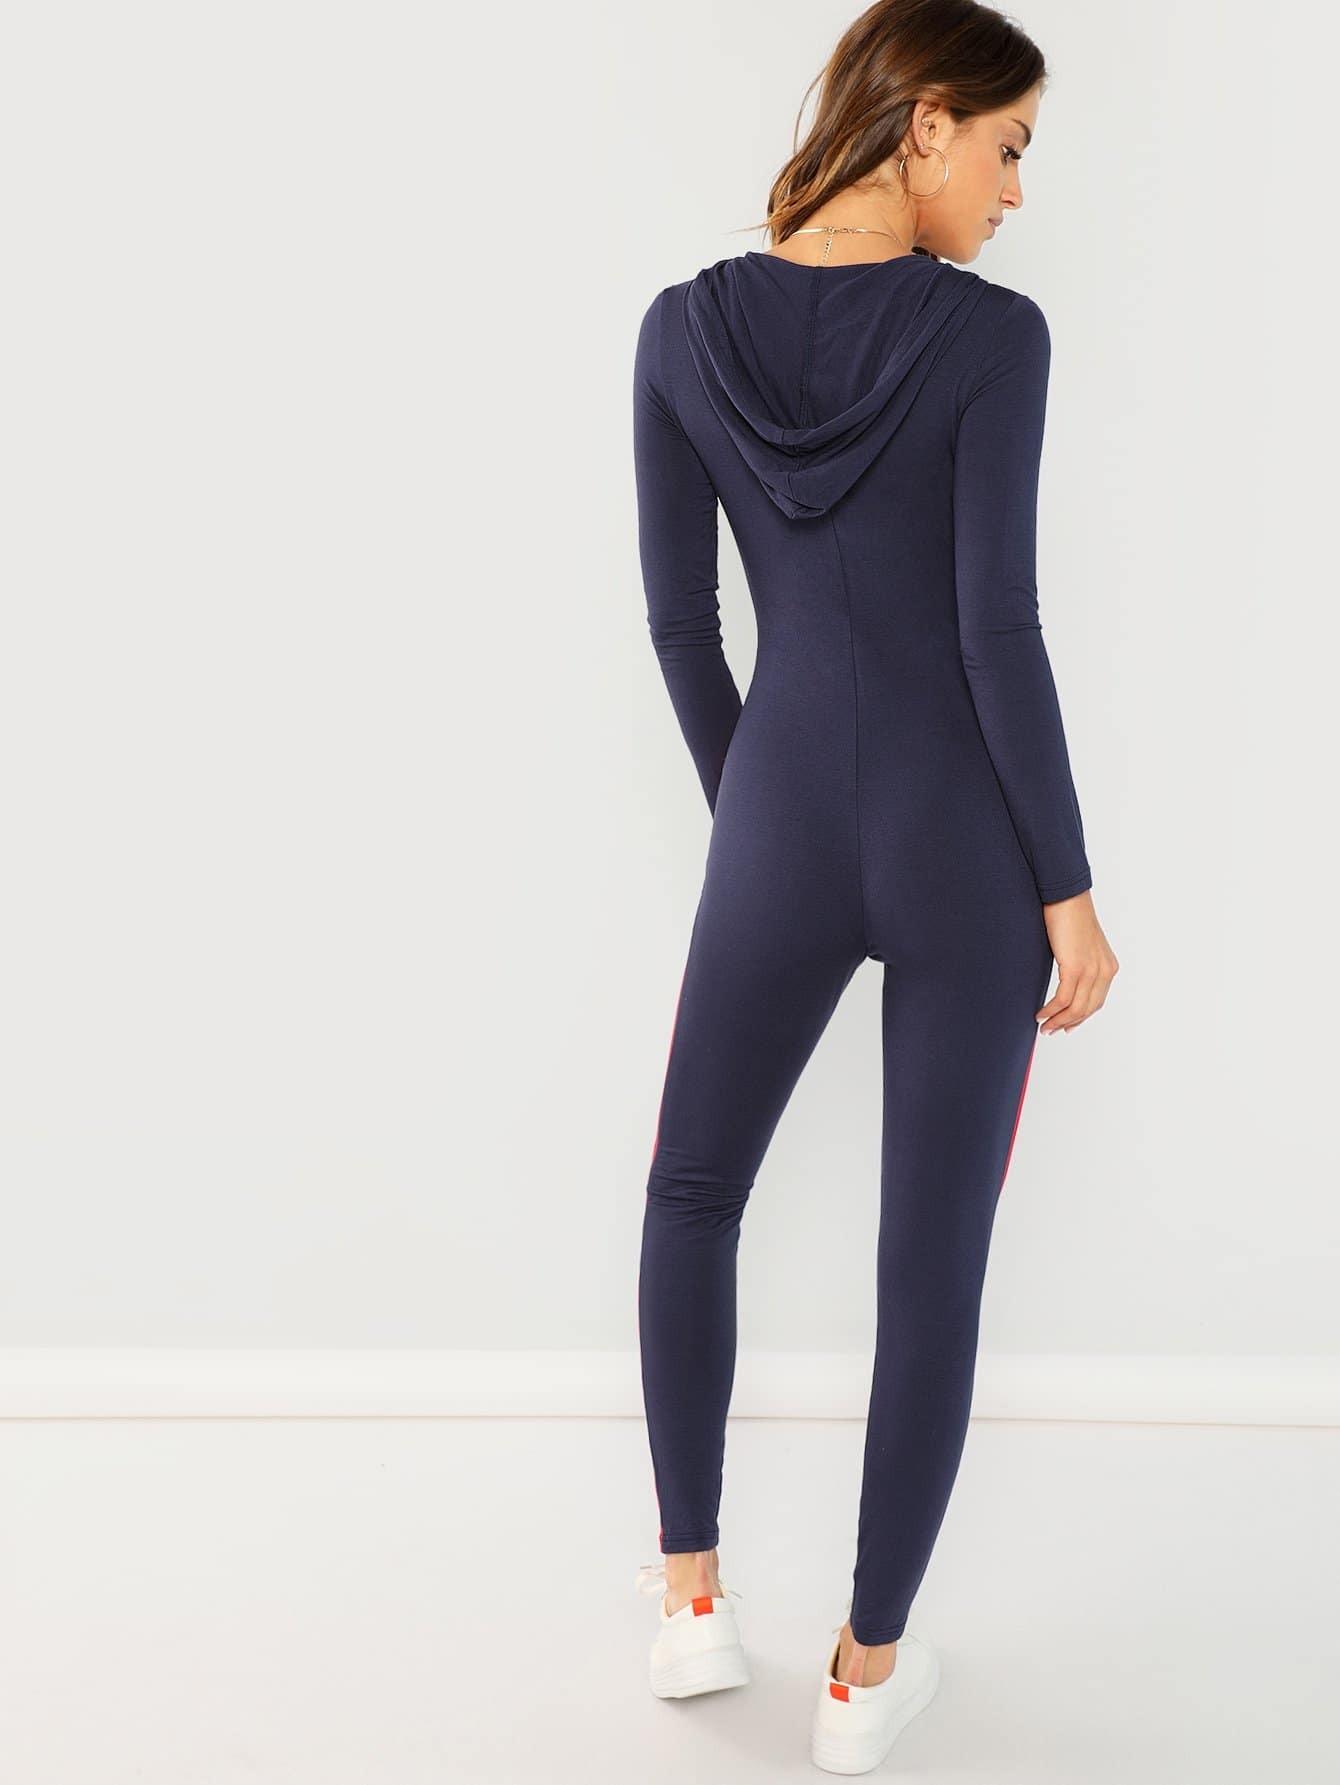 81a1ffa228de Zipper Front Striped Jumpsuit -SheIn(Sheinside)